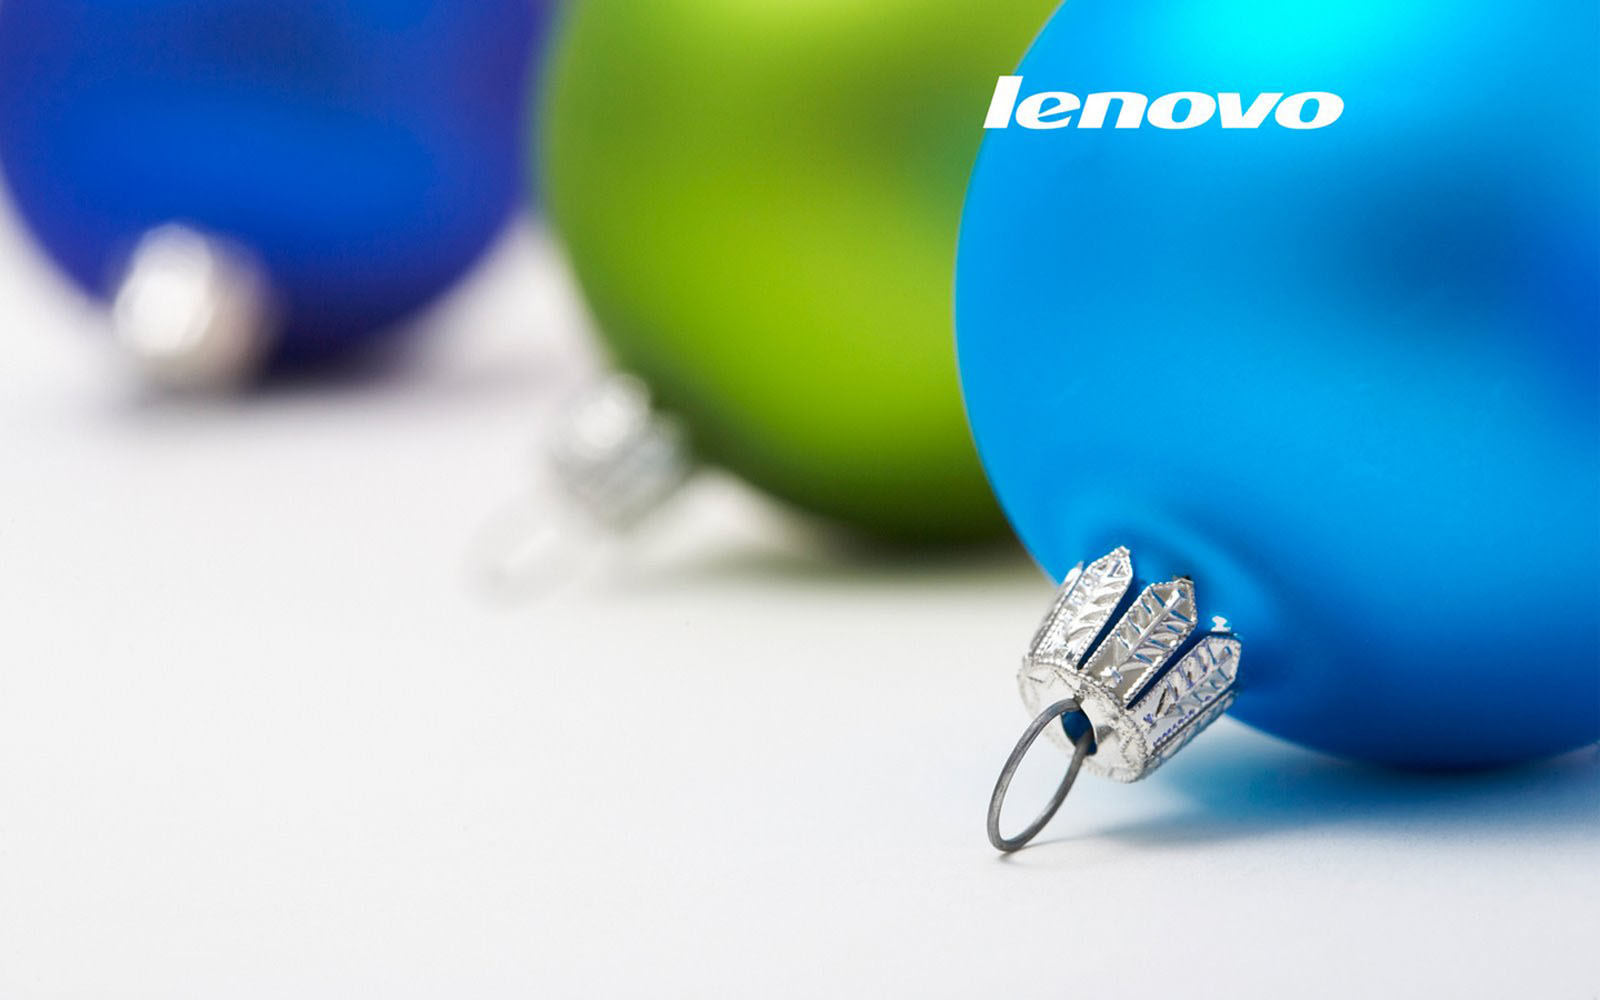 wallpapers: Lenovo Laptop Wallpapers